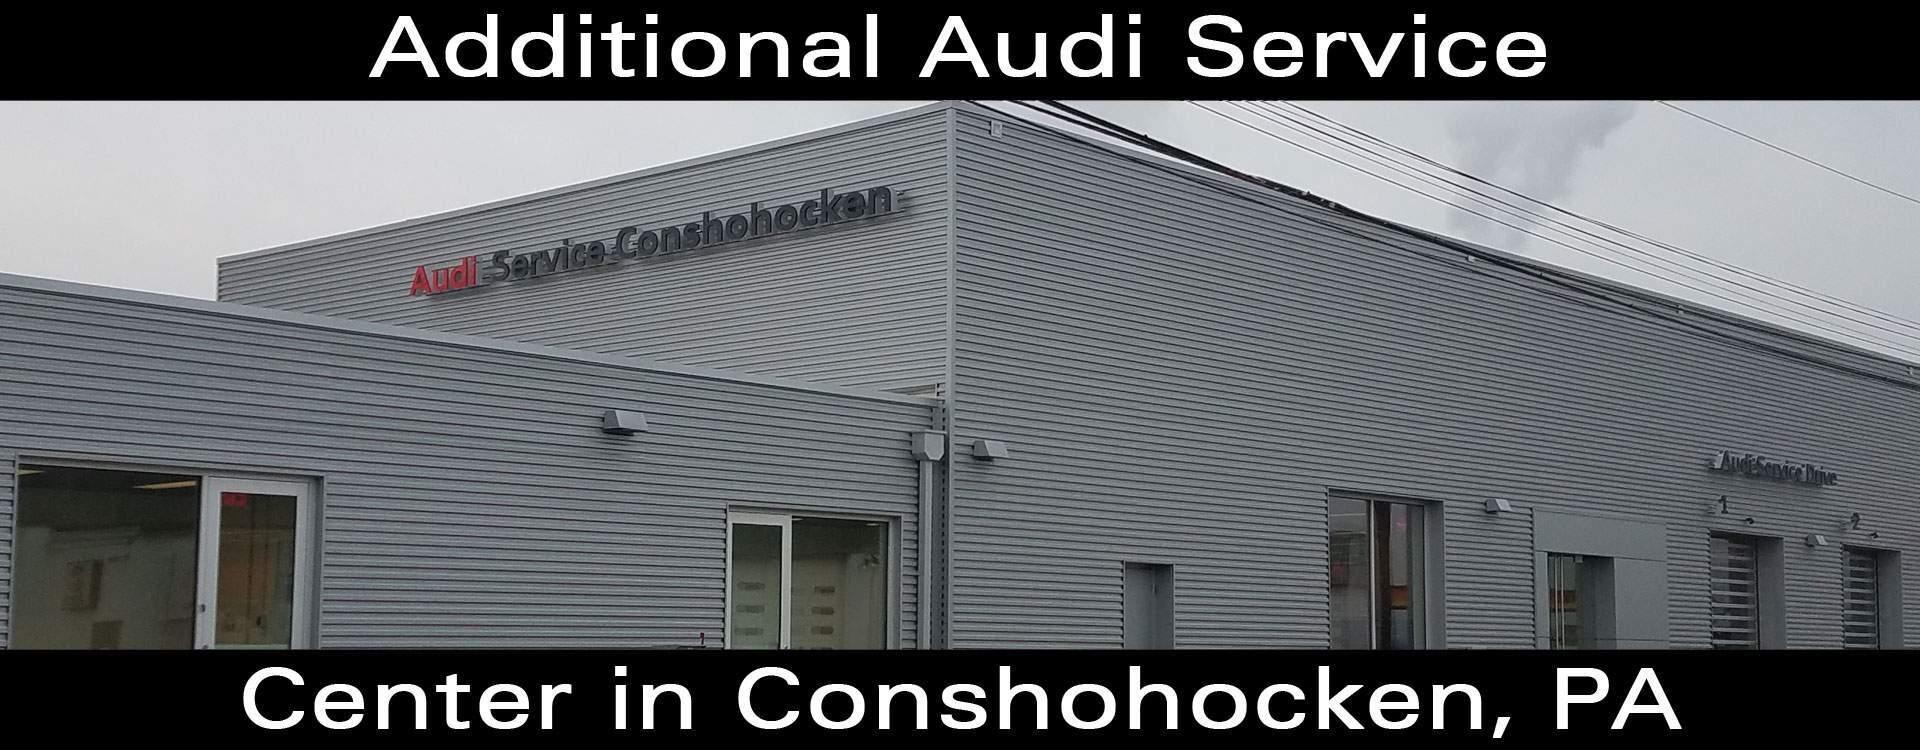 Audi Dealership Wynnewood PA Used Cars Audi Wynnewood - Audi wynnewood